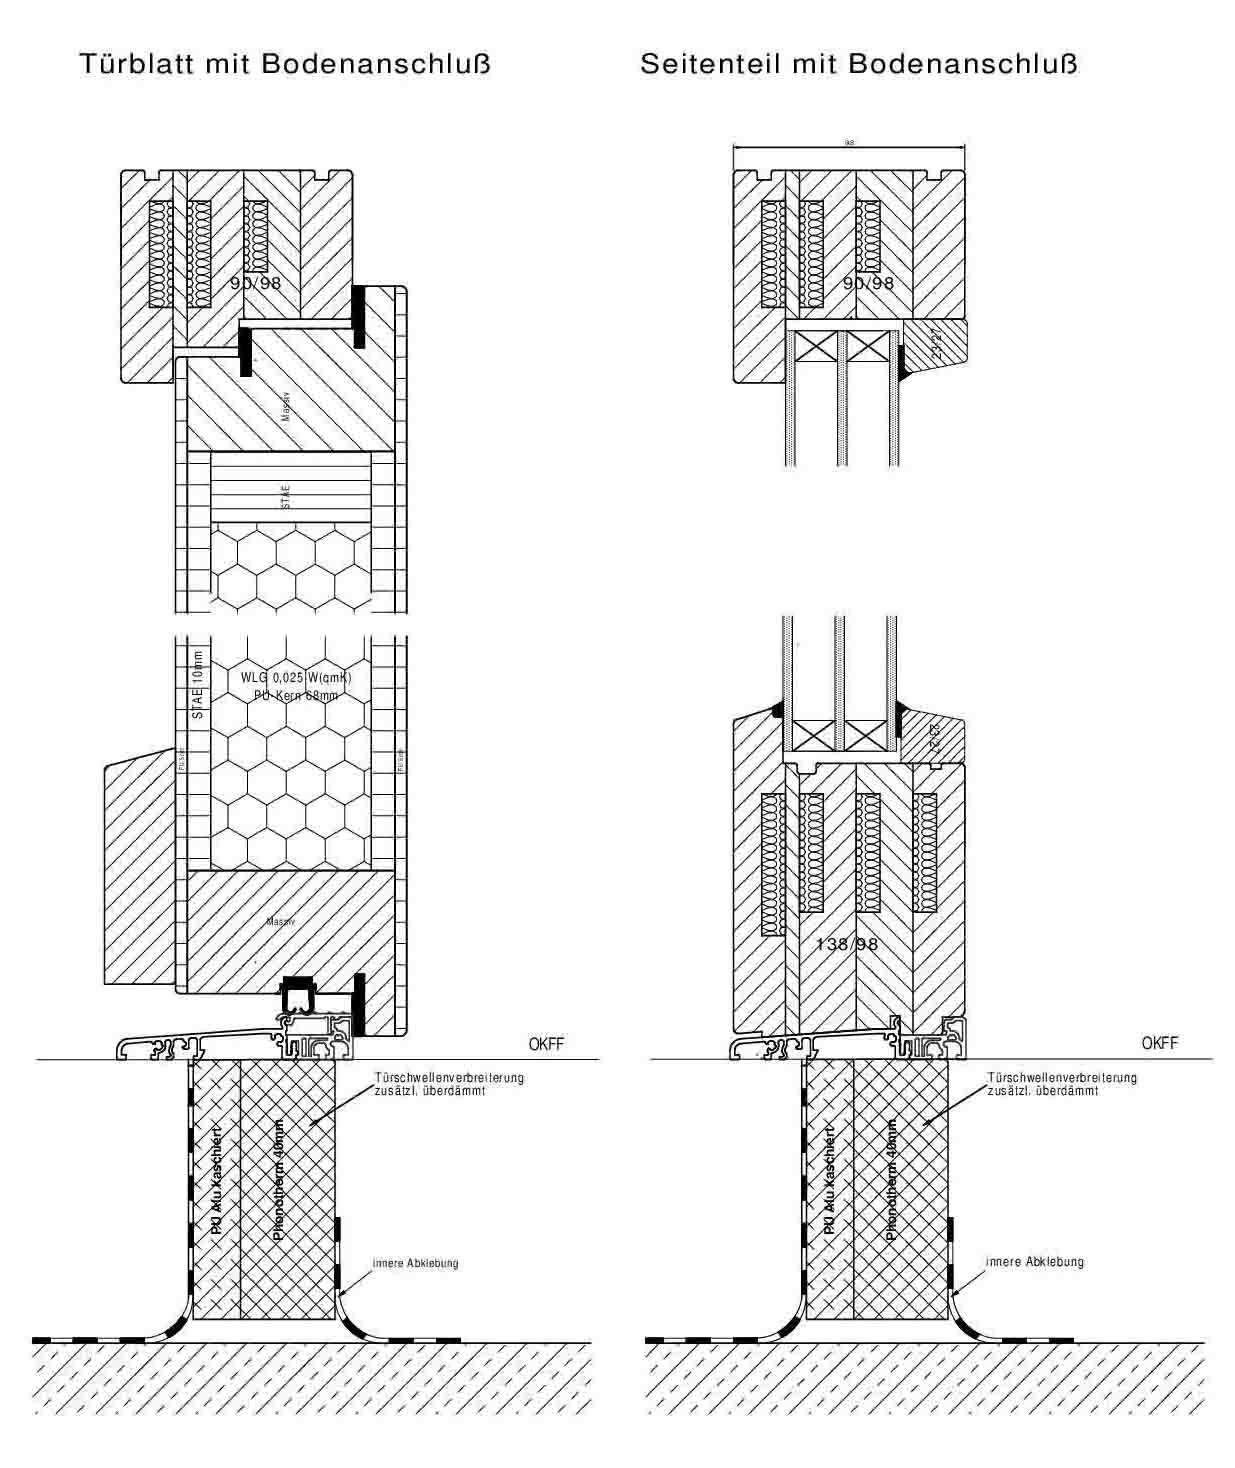 Tür vertikalschnitt  Haustüren Brunkhorst, Haustüren aus Holz, Holzhaustüren ...